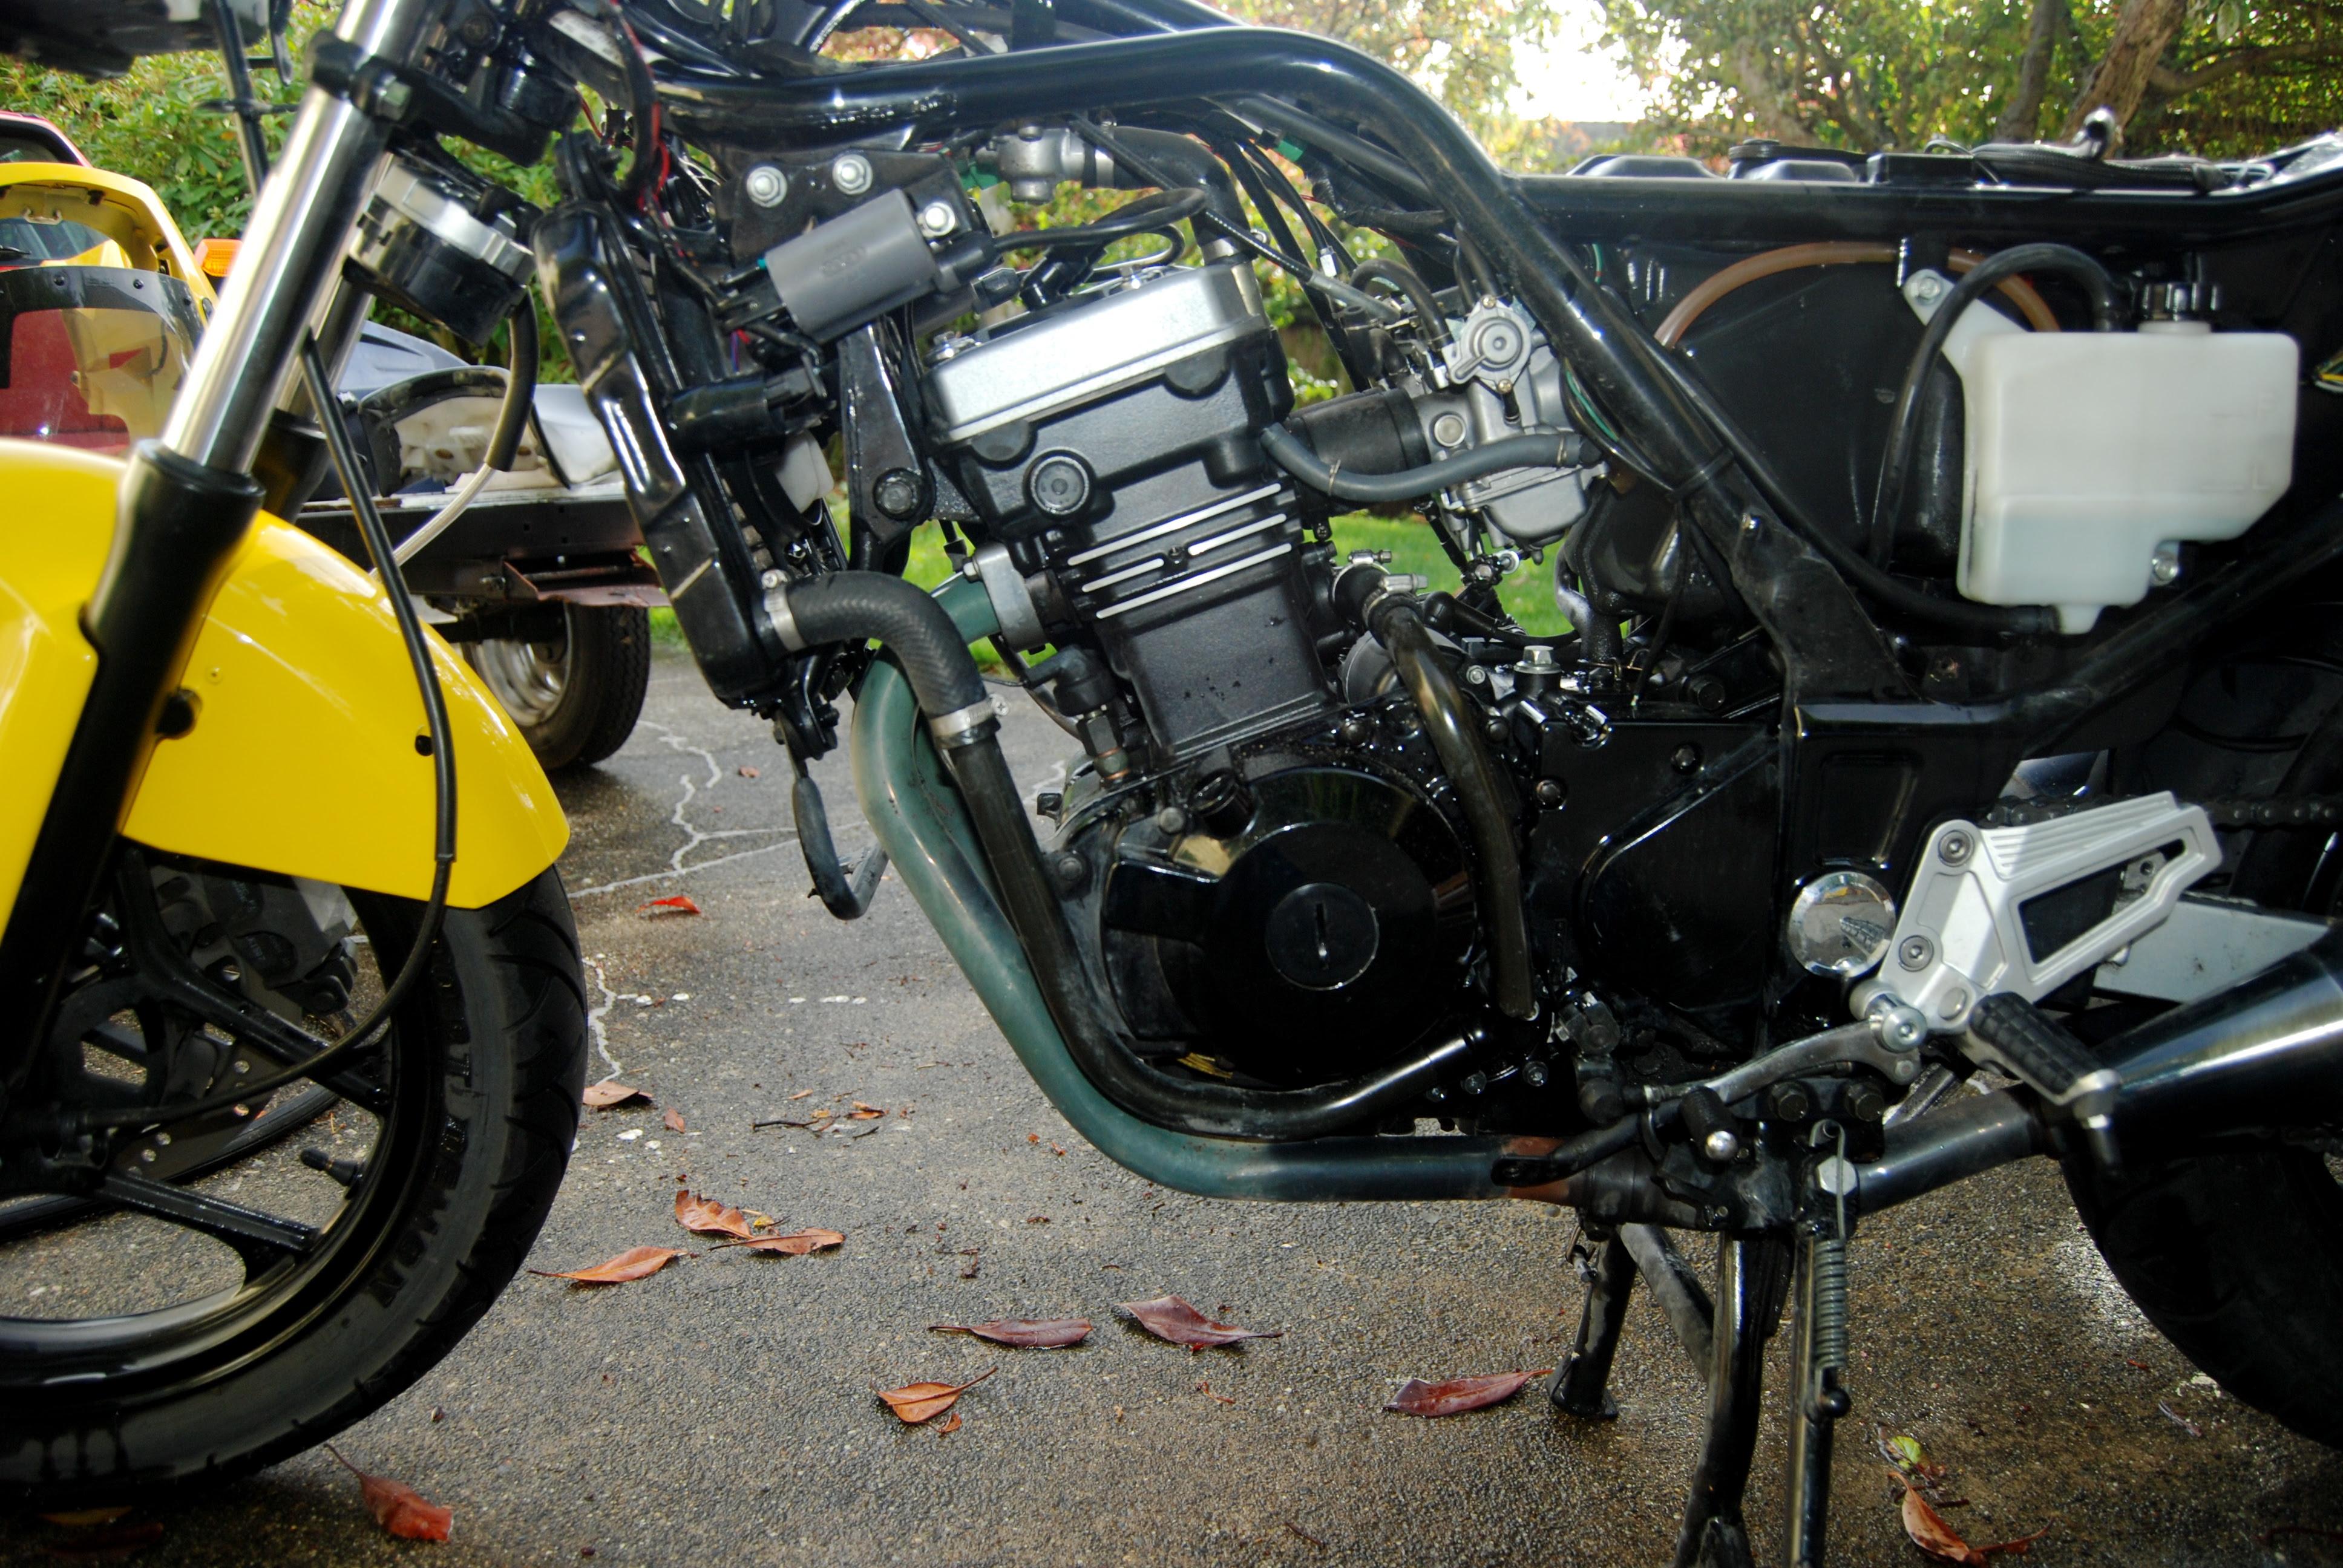 Kawasaki Ninja 250r Review And Photos